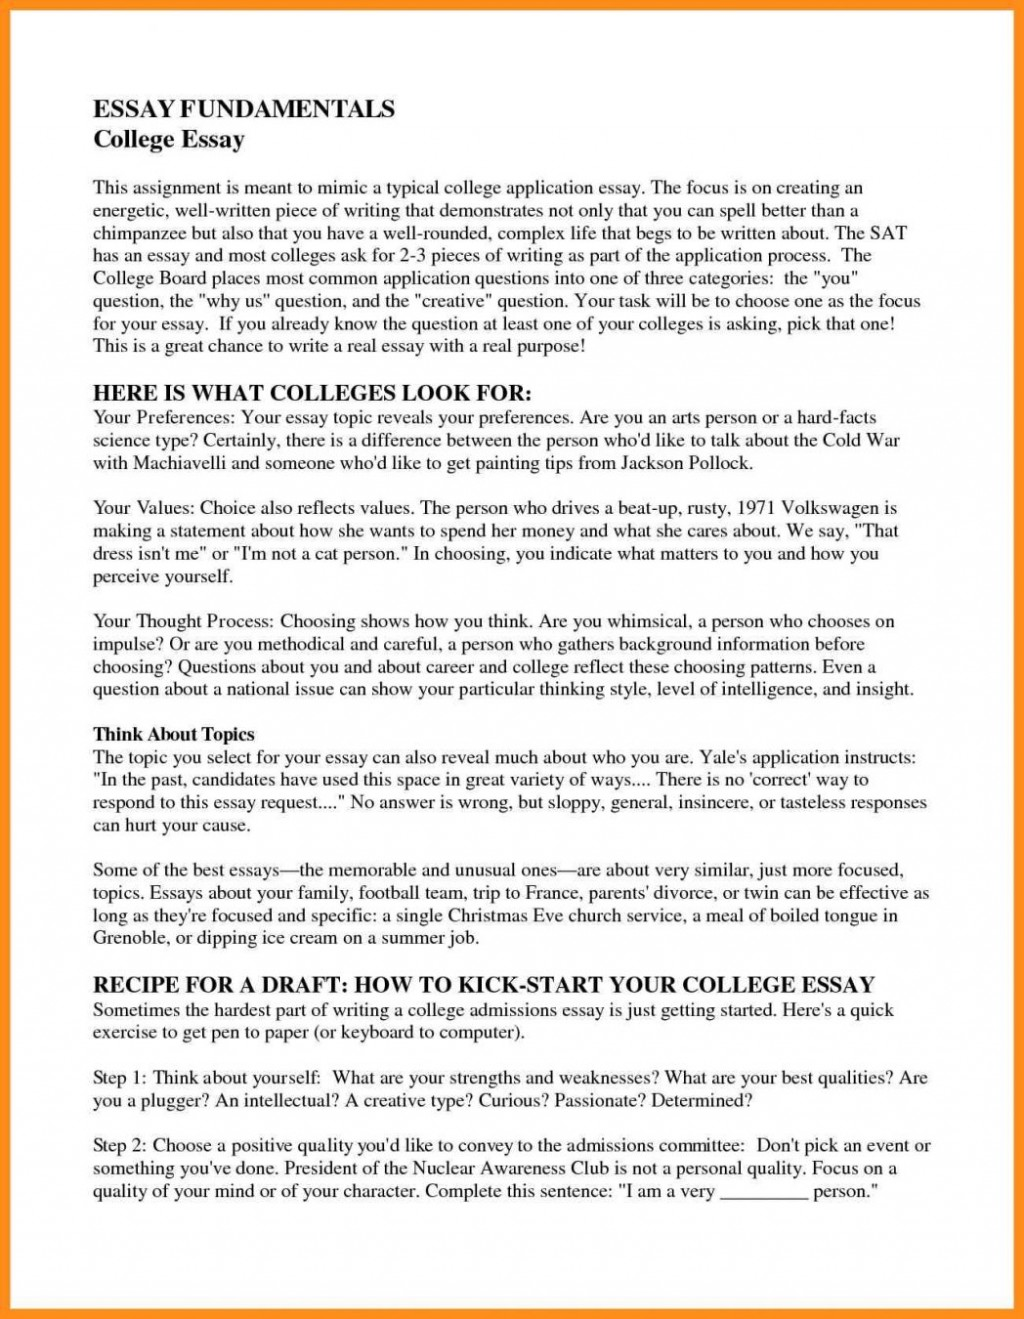 001 Essay Example Write Essays For Money Goal Blockety Co Writing College Newest Depict Jlirxaj Cash Best University High School Reddit Large